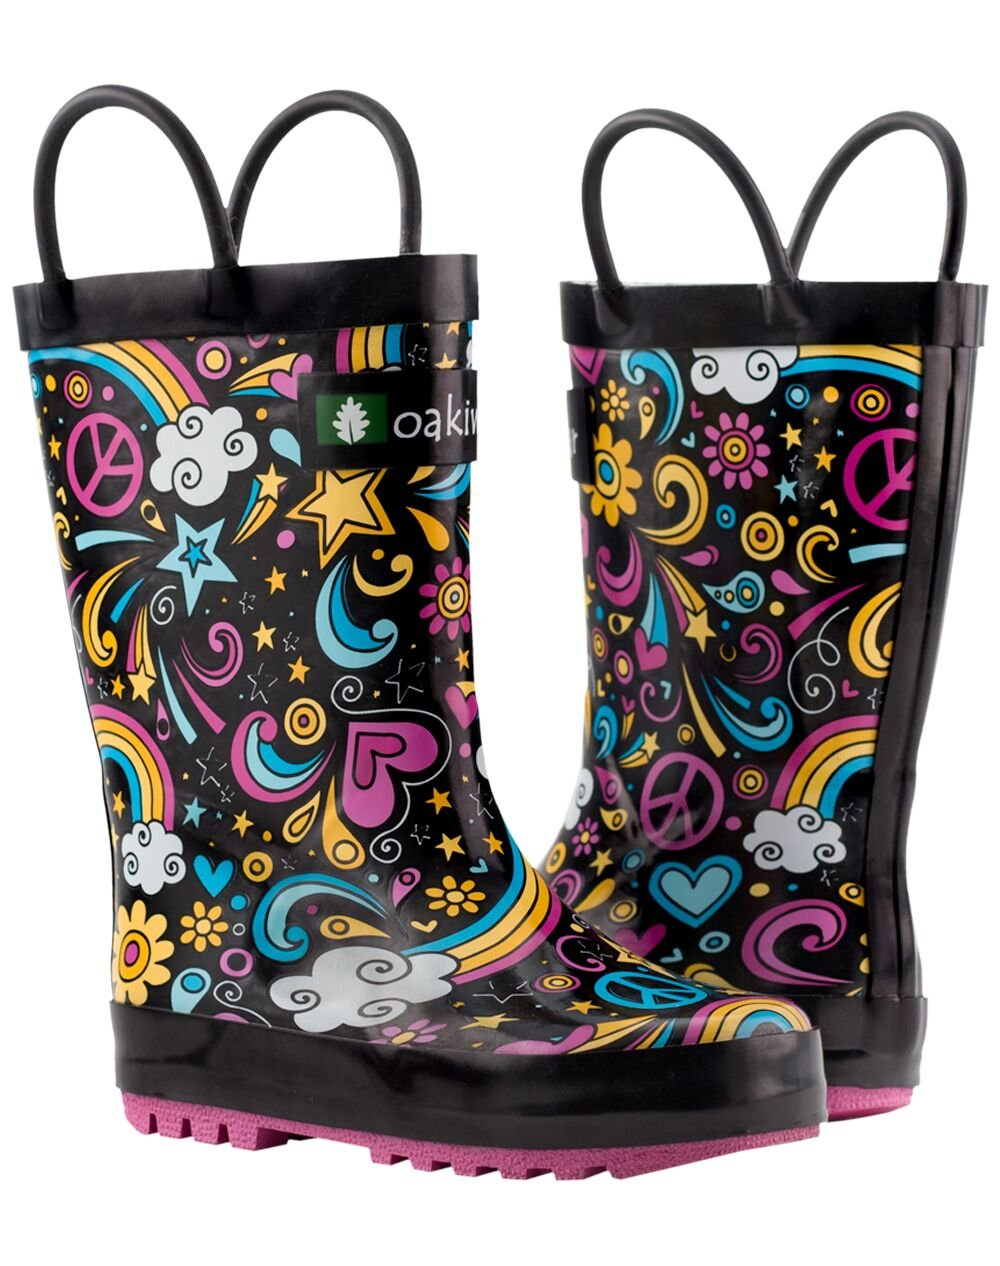 Oakiwear Kids Rubber Rain Boots with Easy-On Handles, Peace, Love & Rainbows, 11T US Toddler, Peace by Oakiwear (Image #10)